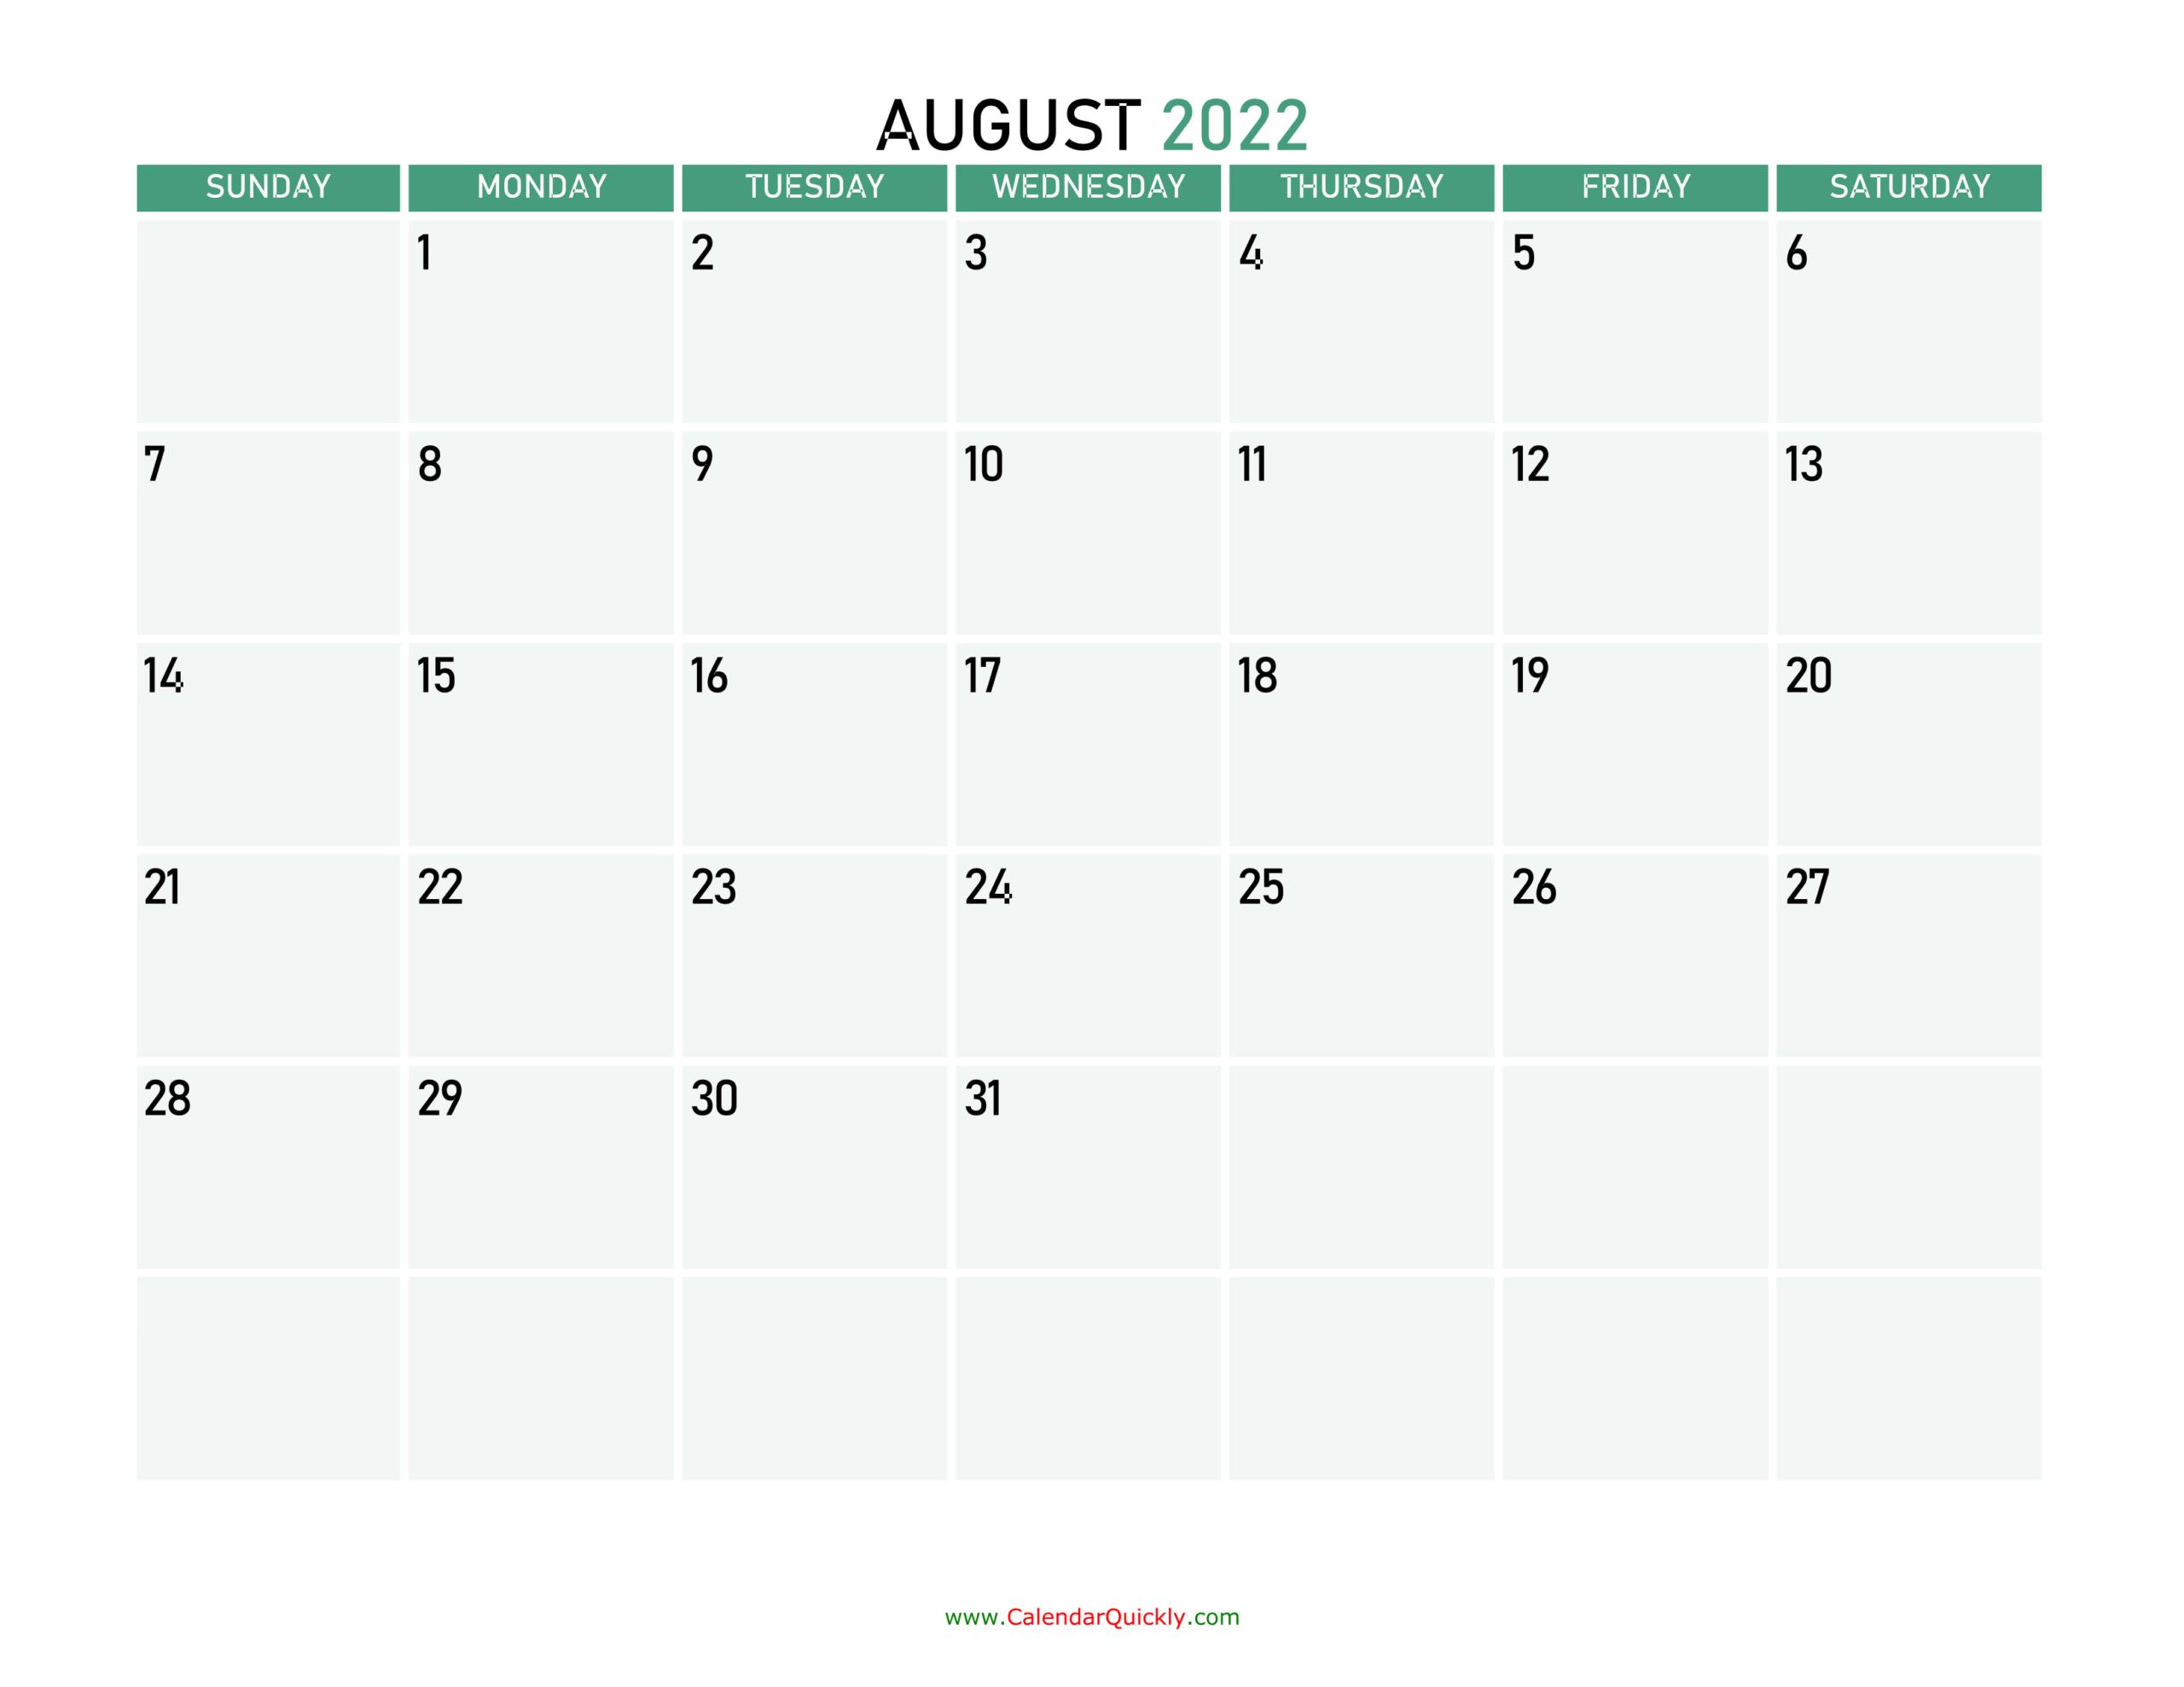 August 2022 Calendars | Calendar Quickly for Printable August And September 2022 Calendar